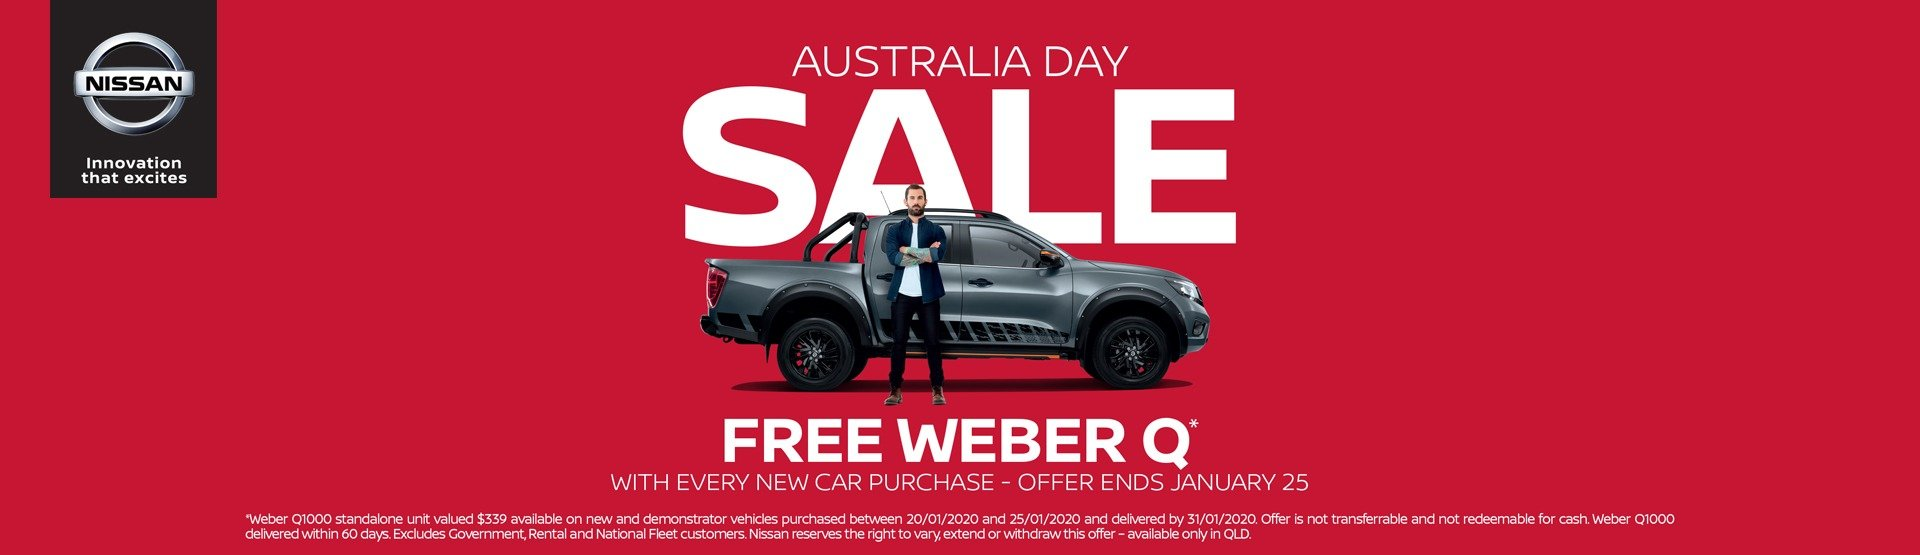 Australia Day Sale